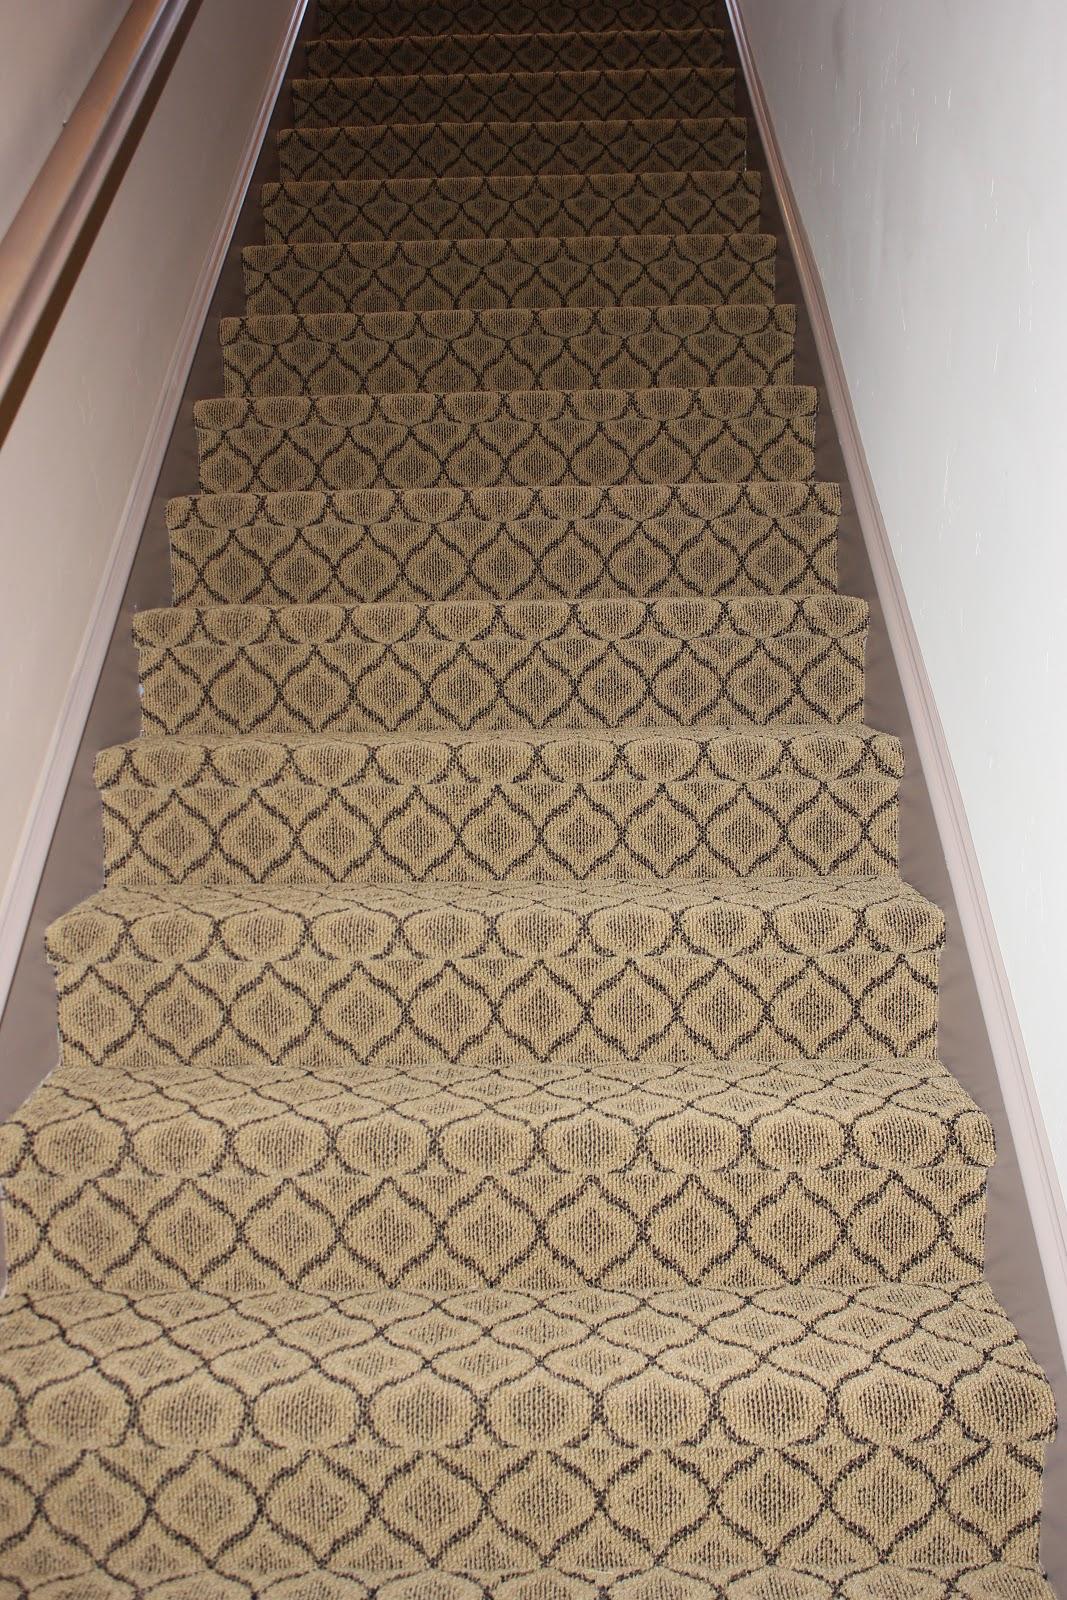 Simas Floor And Design Company Hardwood Flooring By Royal Oak